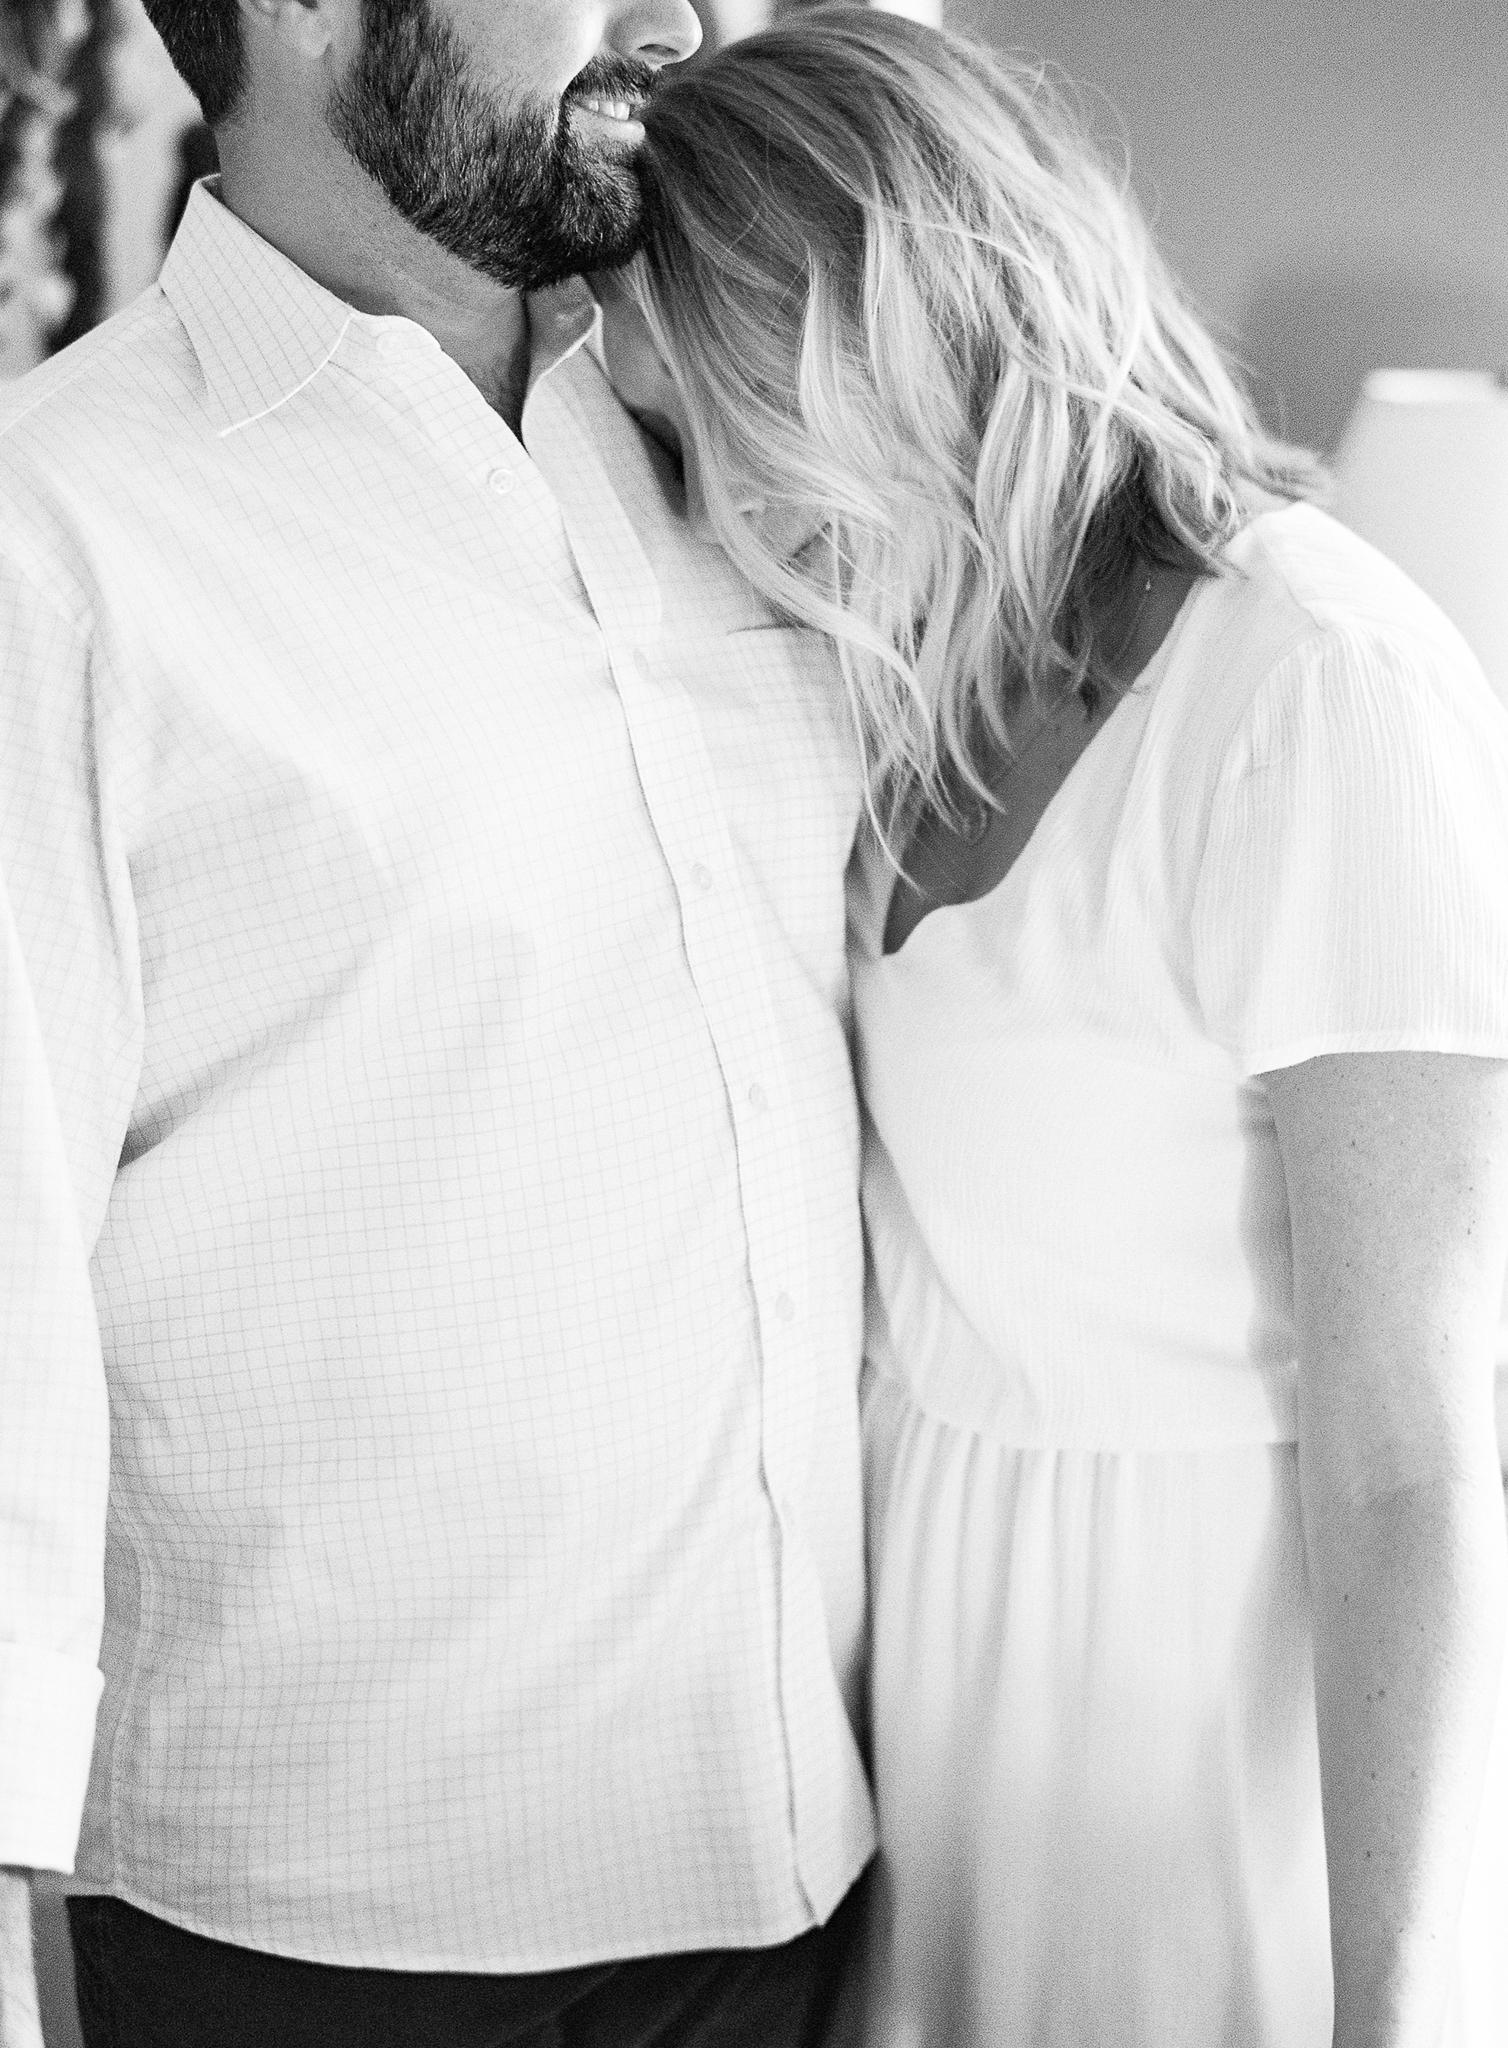 Meghan Mehan Photography - Fine Art Film Wedding Photography - San Francisco   Napa   Sonoma   Big Sur   Chicago   Minneapolis   Milwaukee   Lake Geneva   Door County   Wisconsin 019.jpg